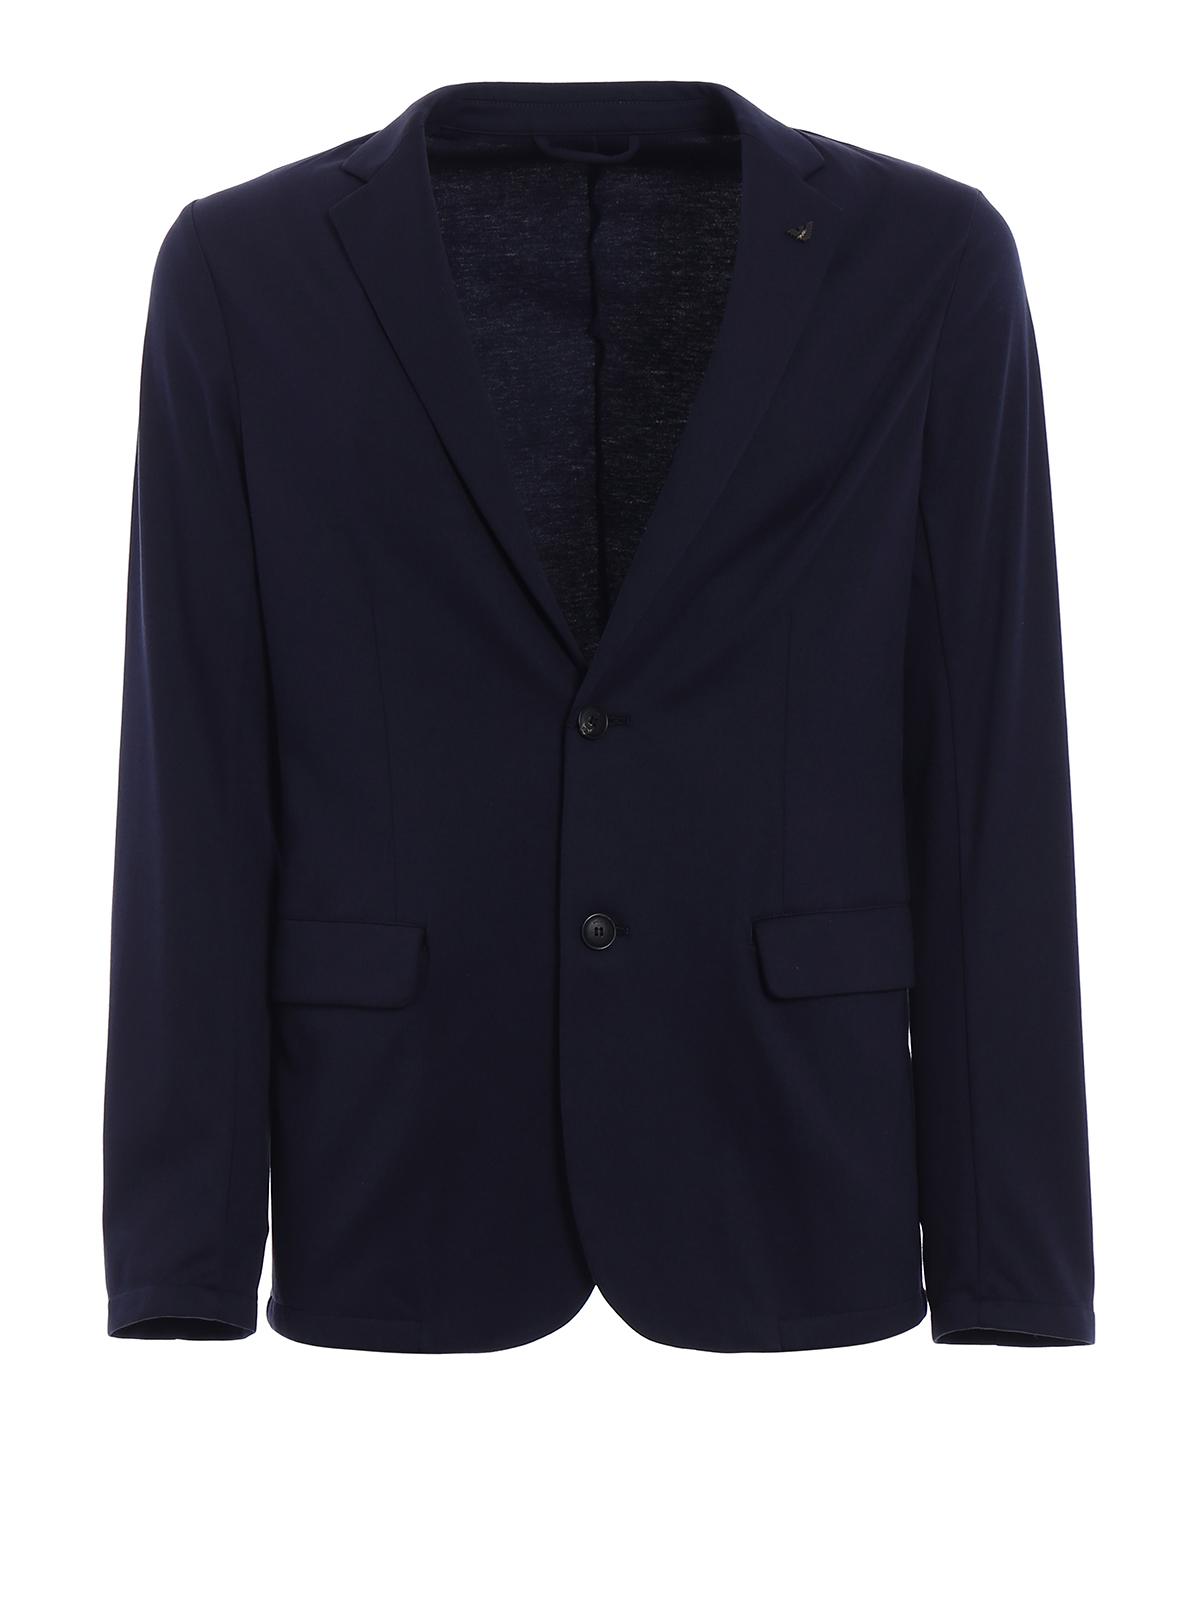 Blazer 3z1g81 Emporio Armani De Costume Bleu Vestes Foncé qR8wP6R5